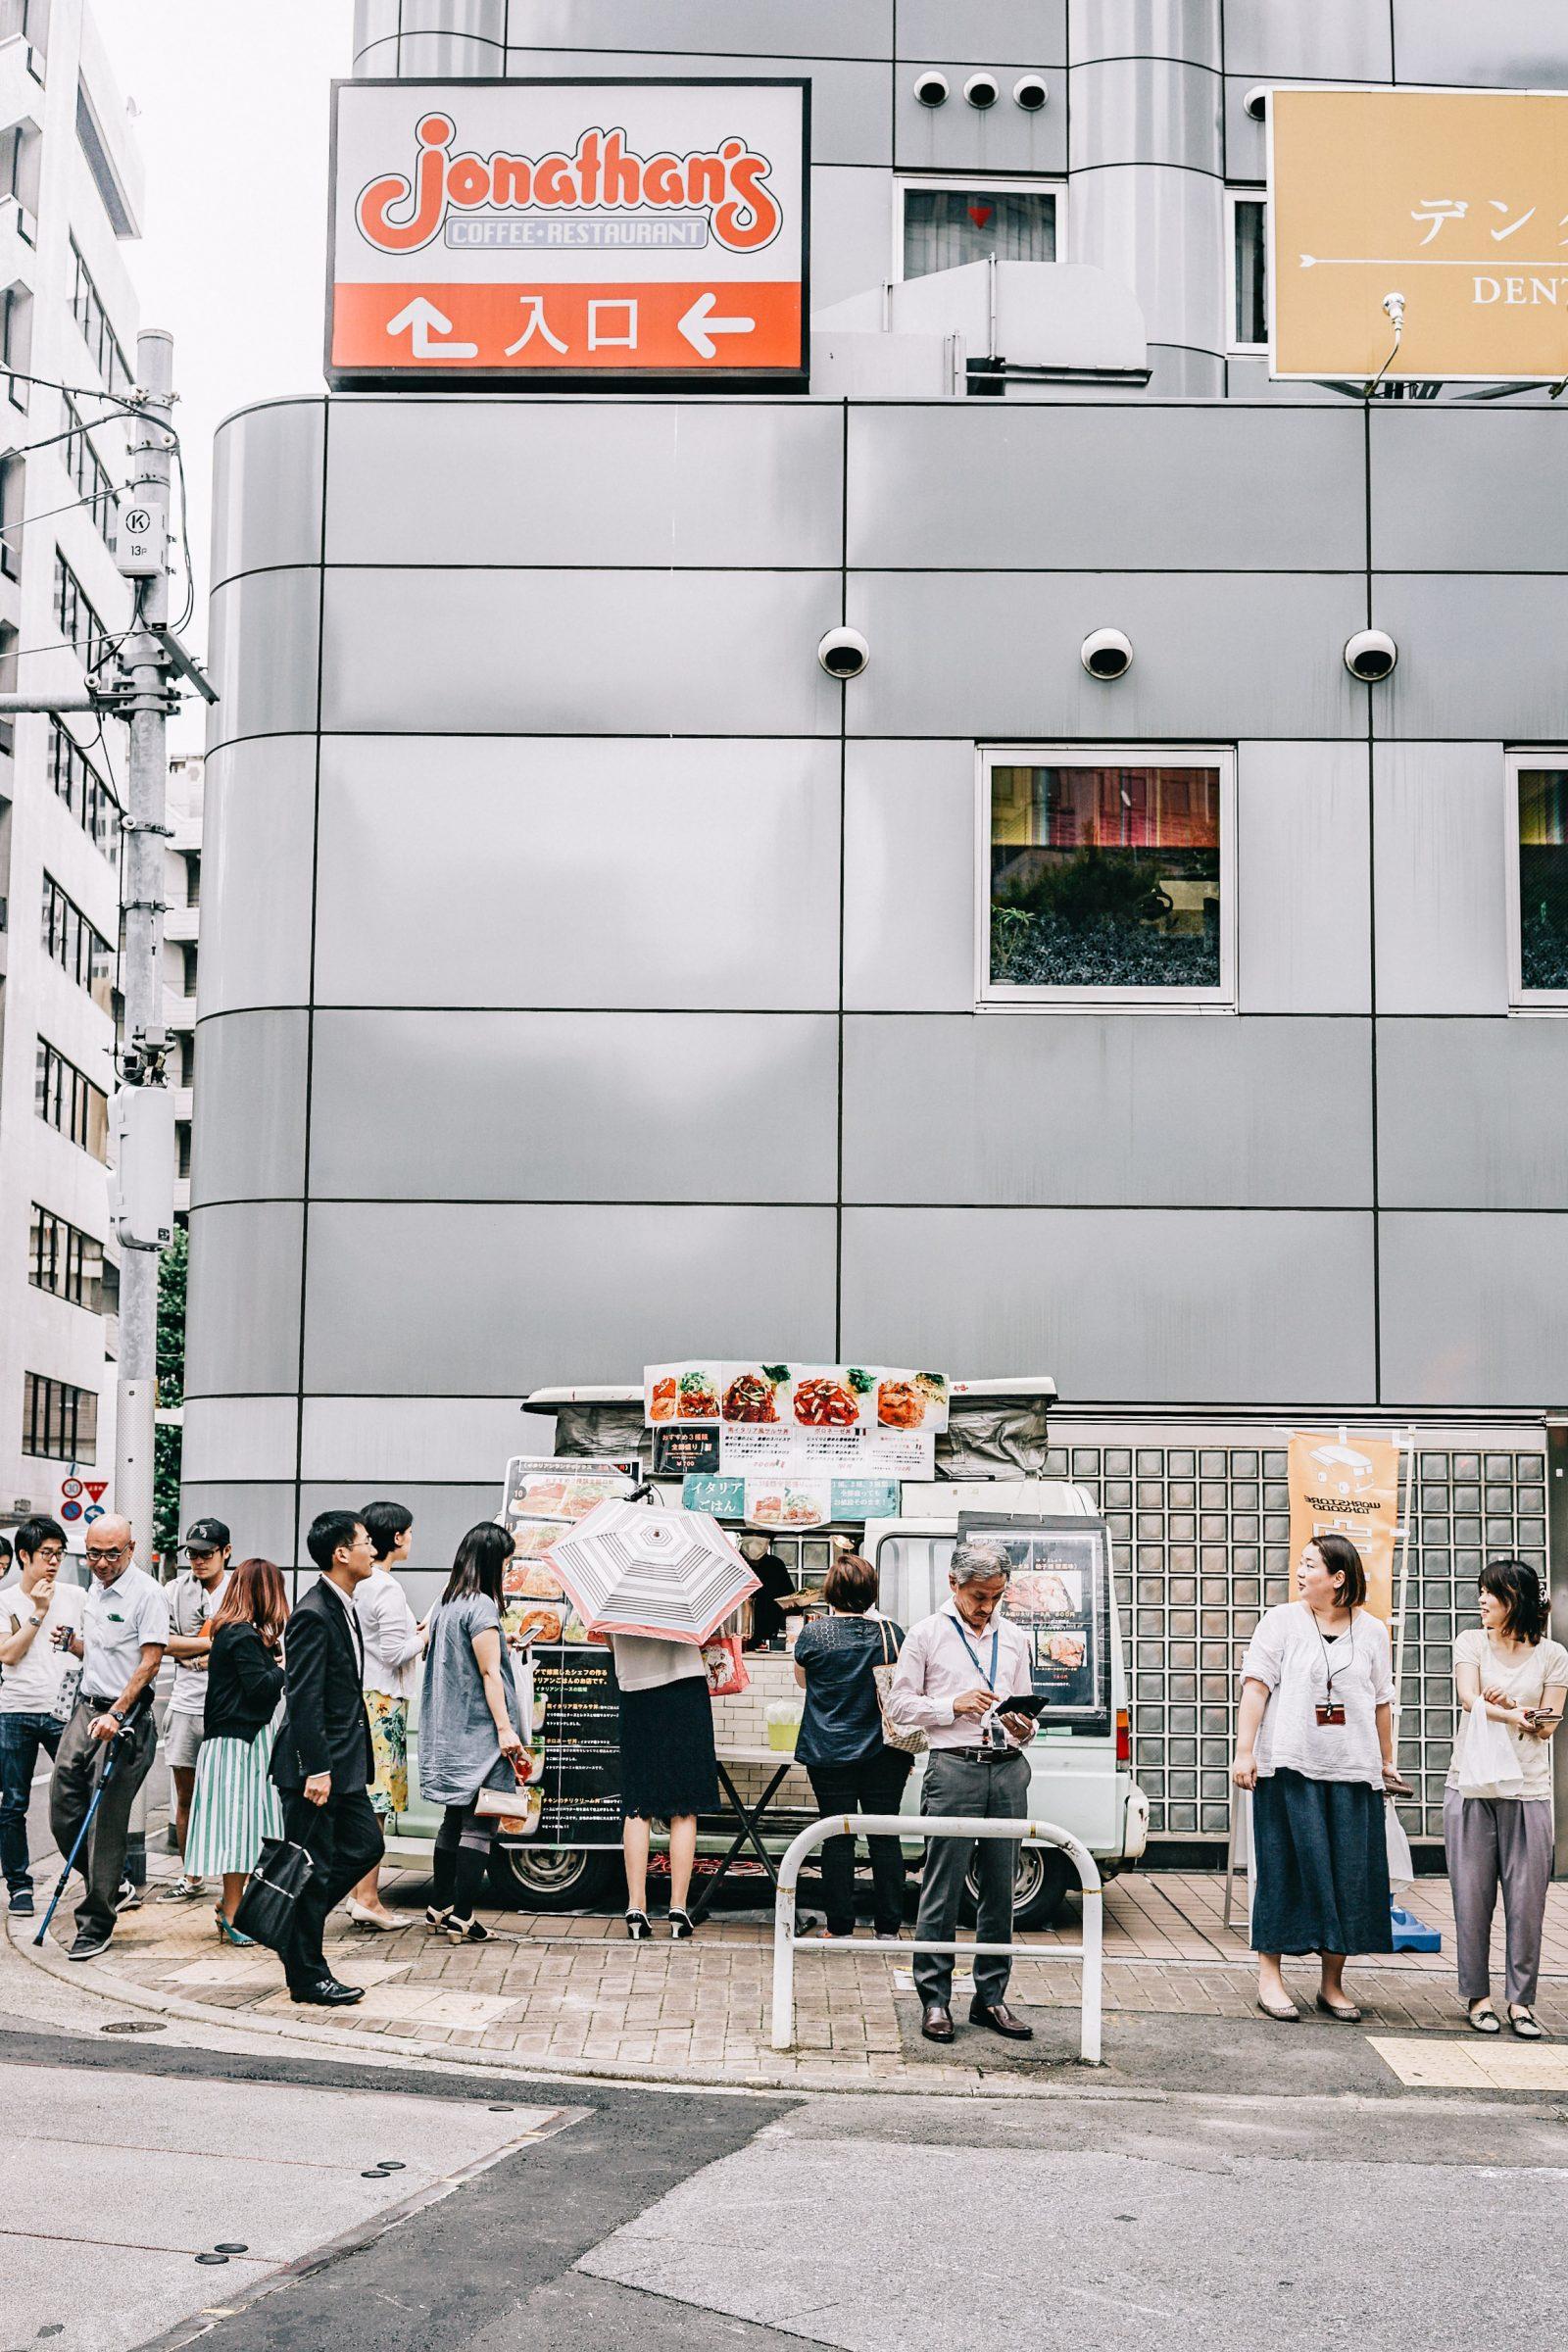 tokyo_travel_guide-outfit-collage_vintage-street_style-off_the_shoulders_dress-mustard_dress-soludos_sandals-chanel_vintage-bag-vintage_stores-2